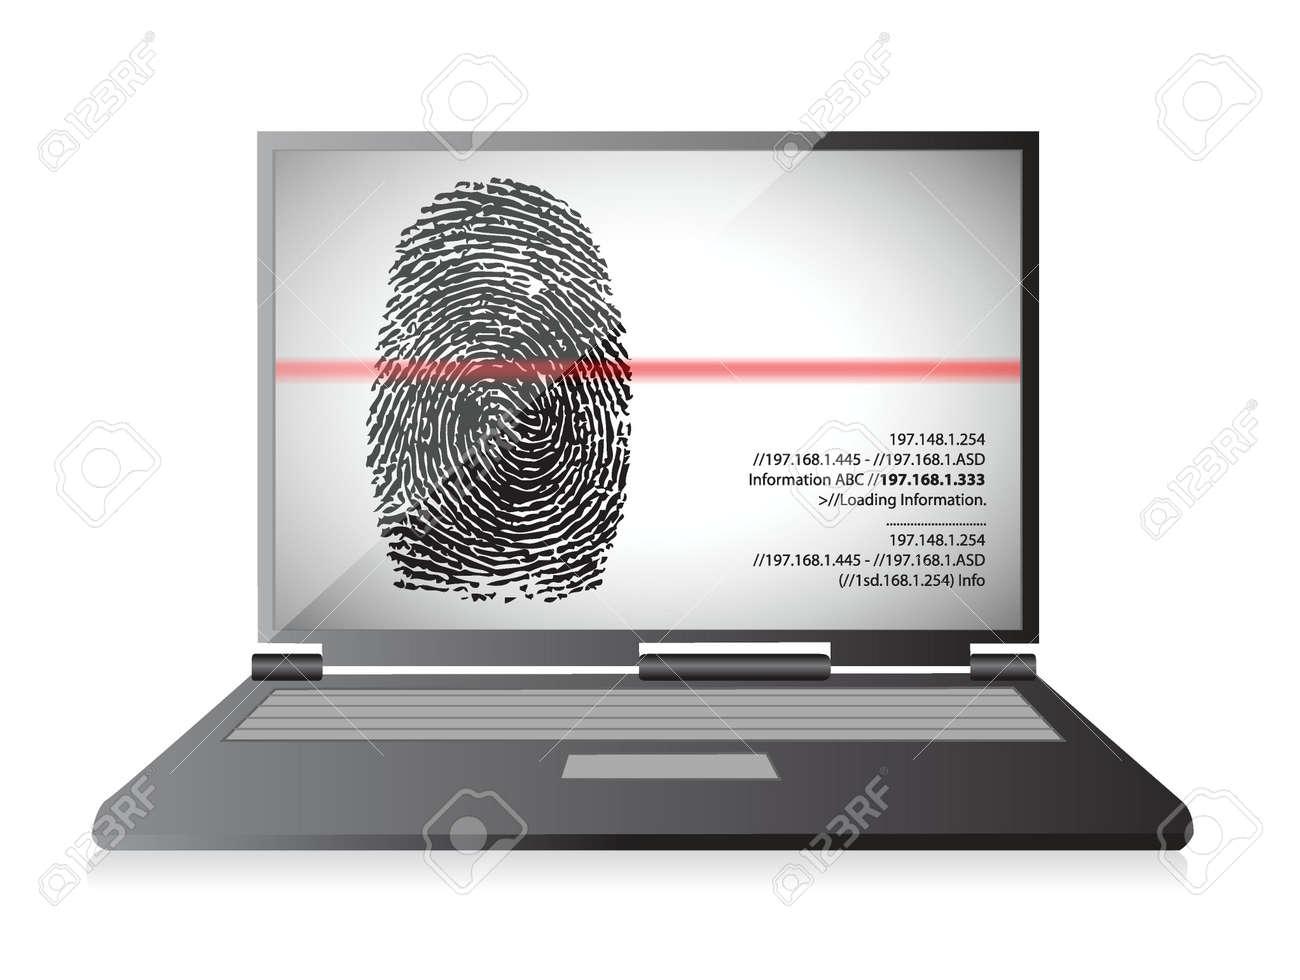 laptop computer scanning a finger print illustration design over white Stock Vector - 19453104